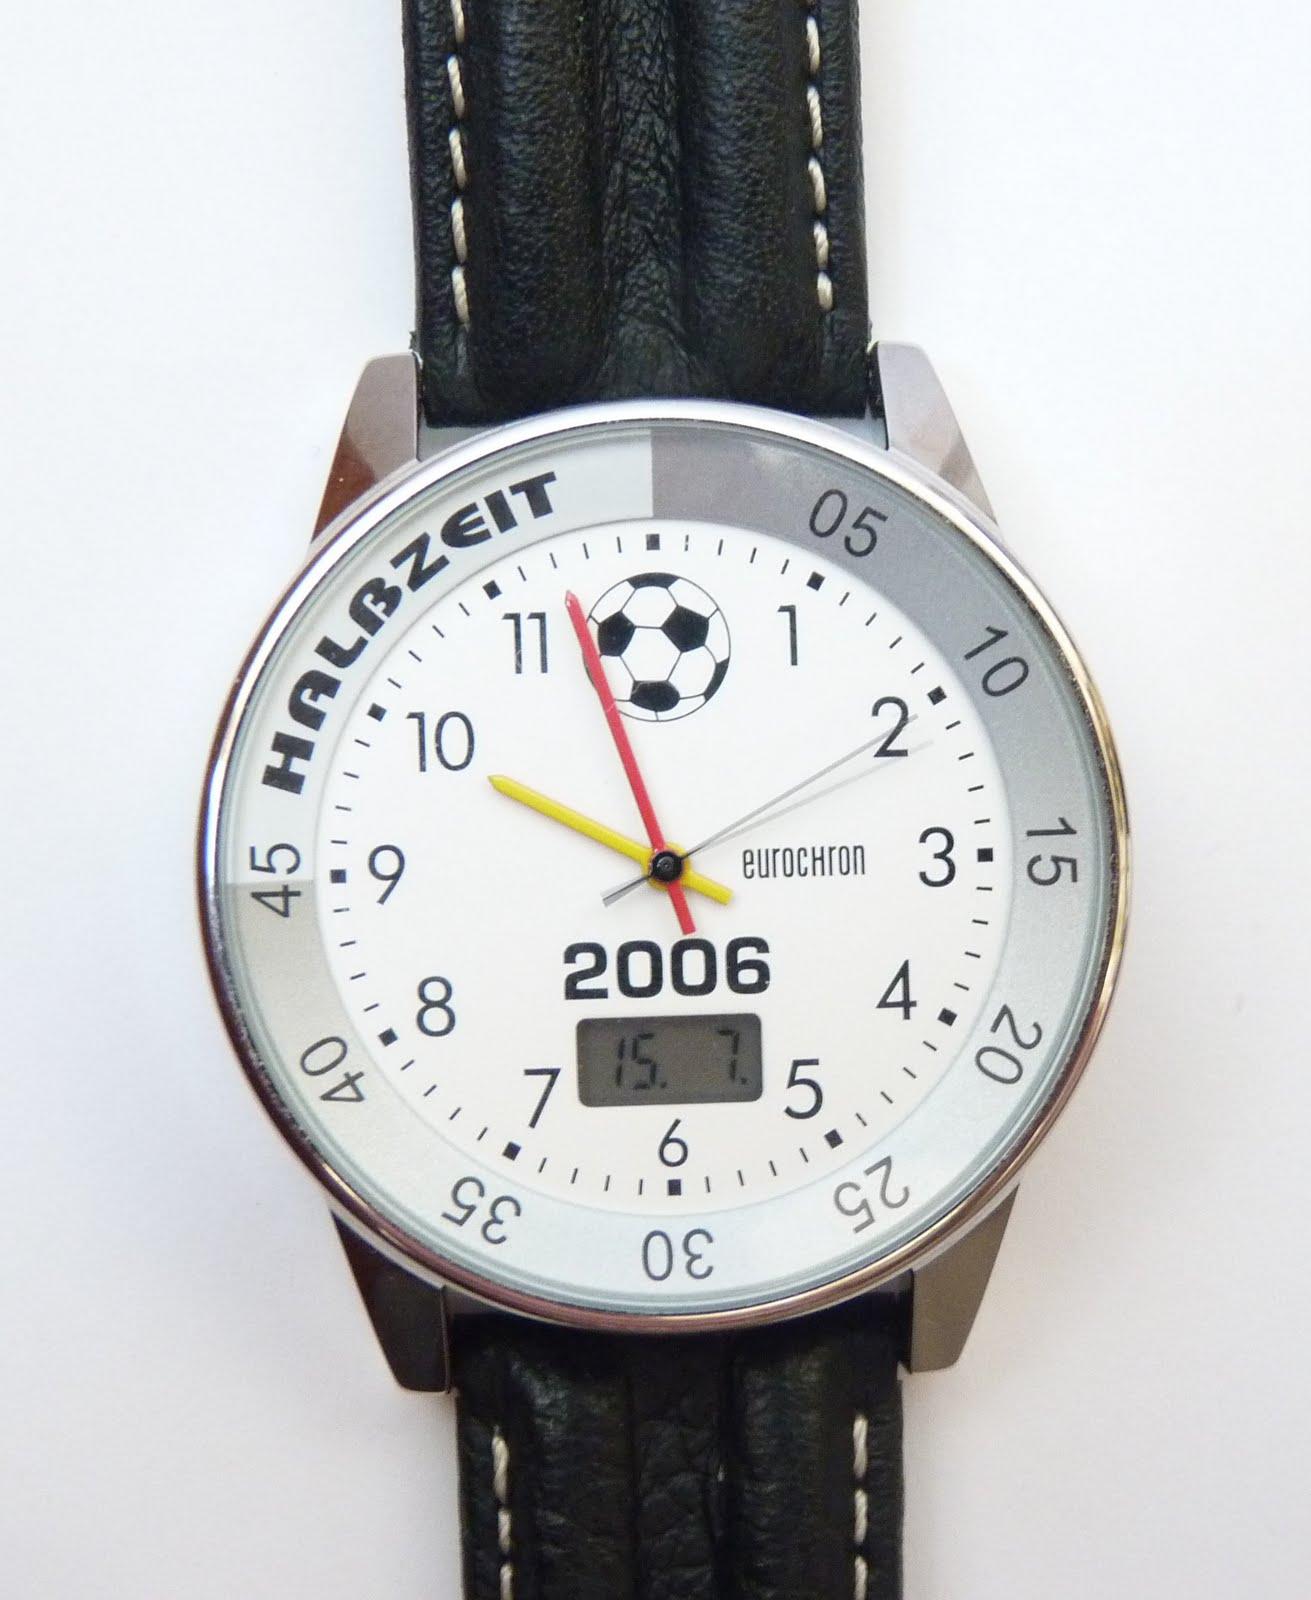 Инструкция к часам eurochron онлайн